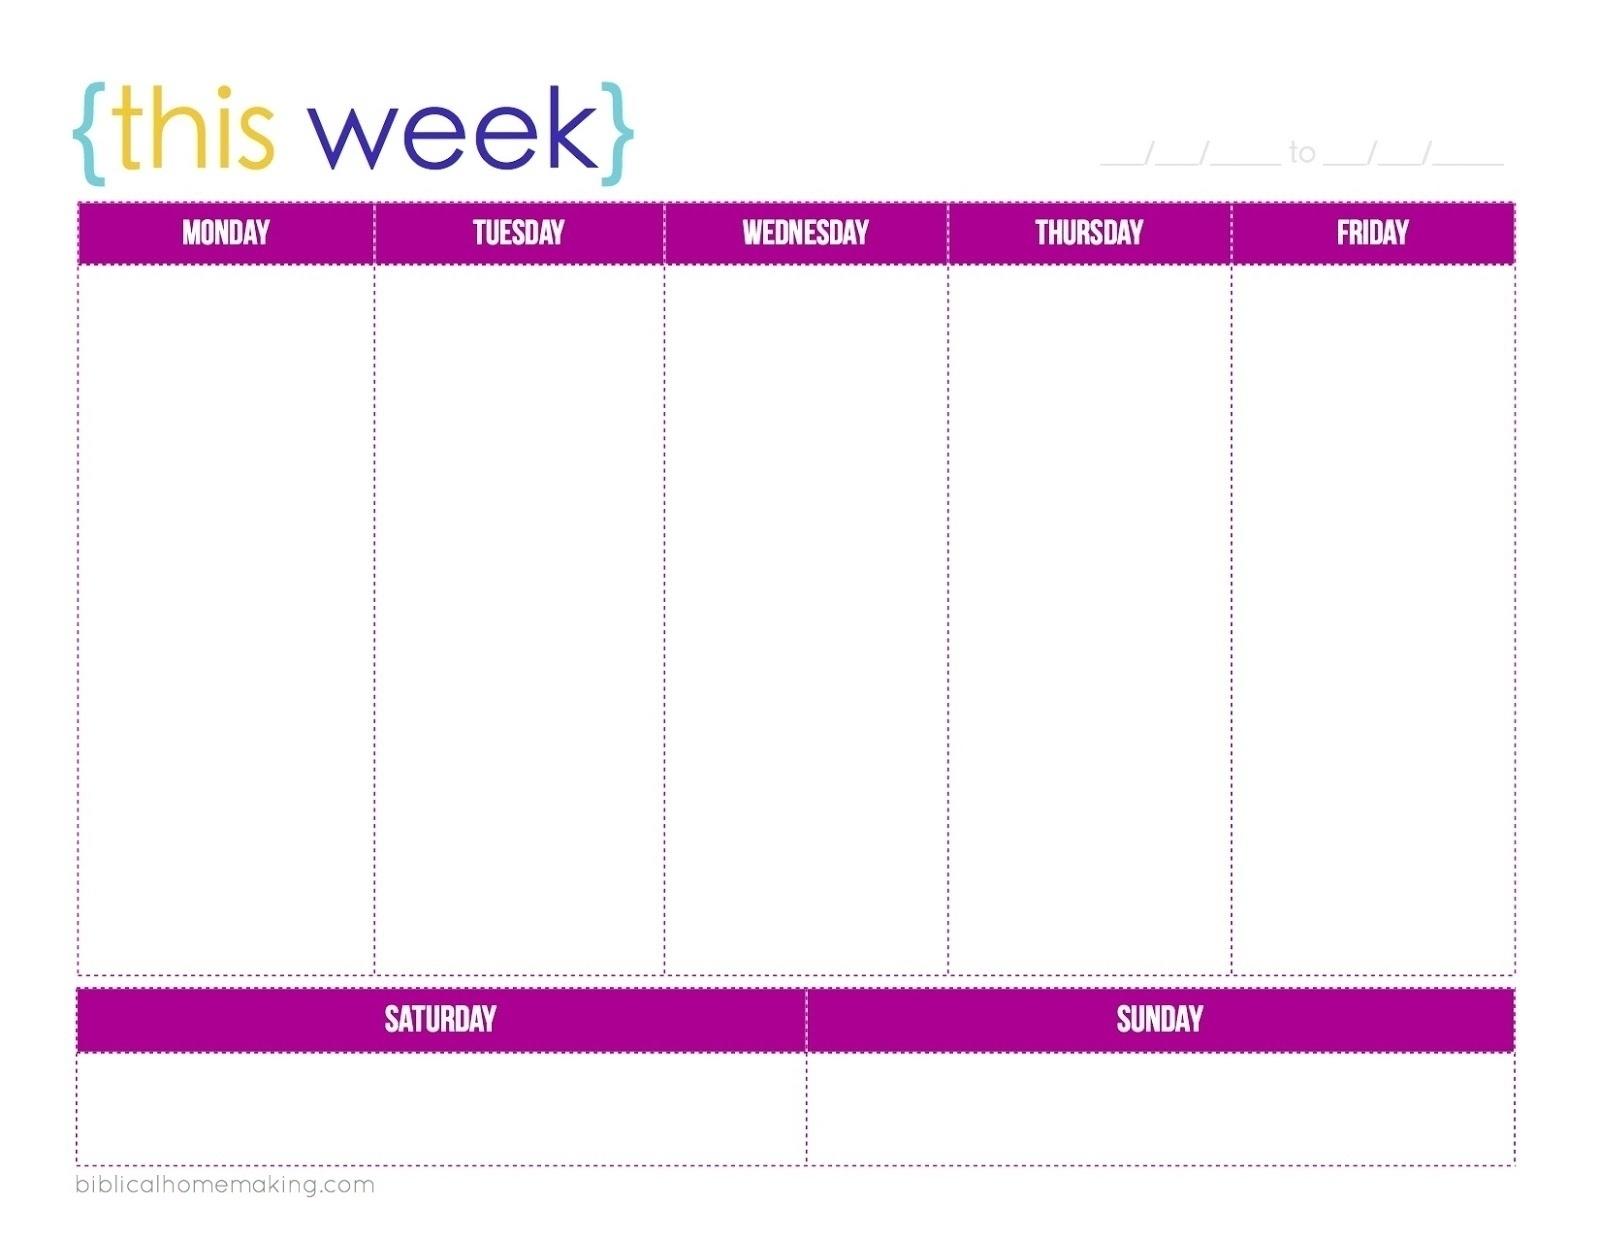 Blank 5 Day Calendar Printable | Template Calendar Printable_5 Day Calendar Blank